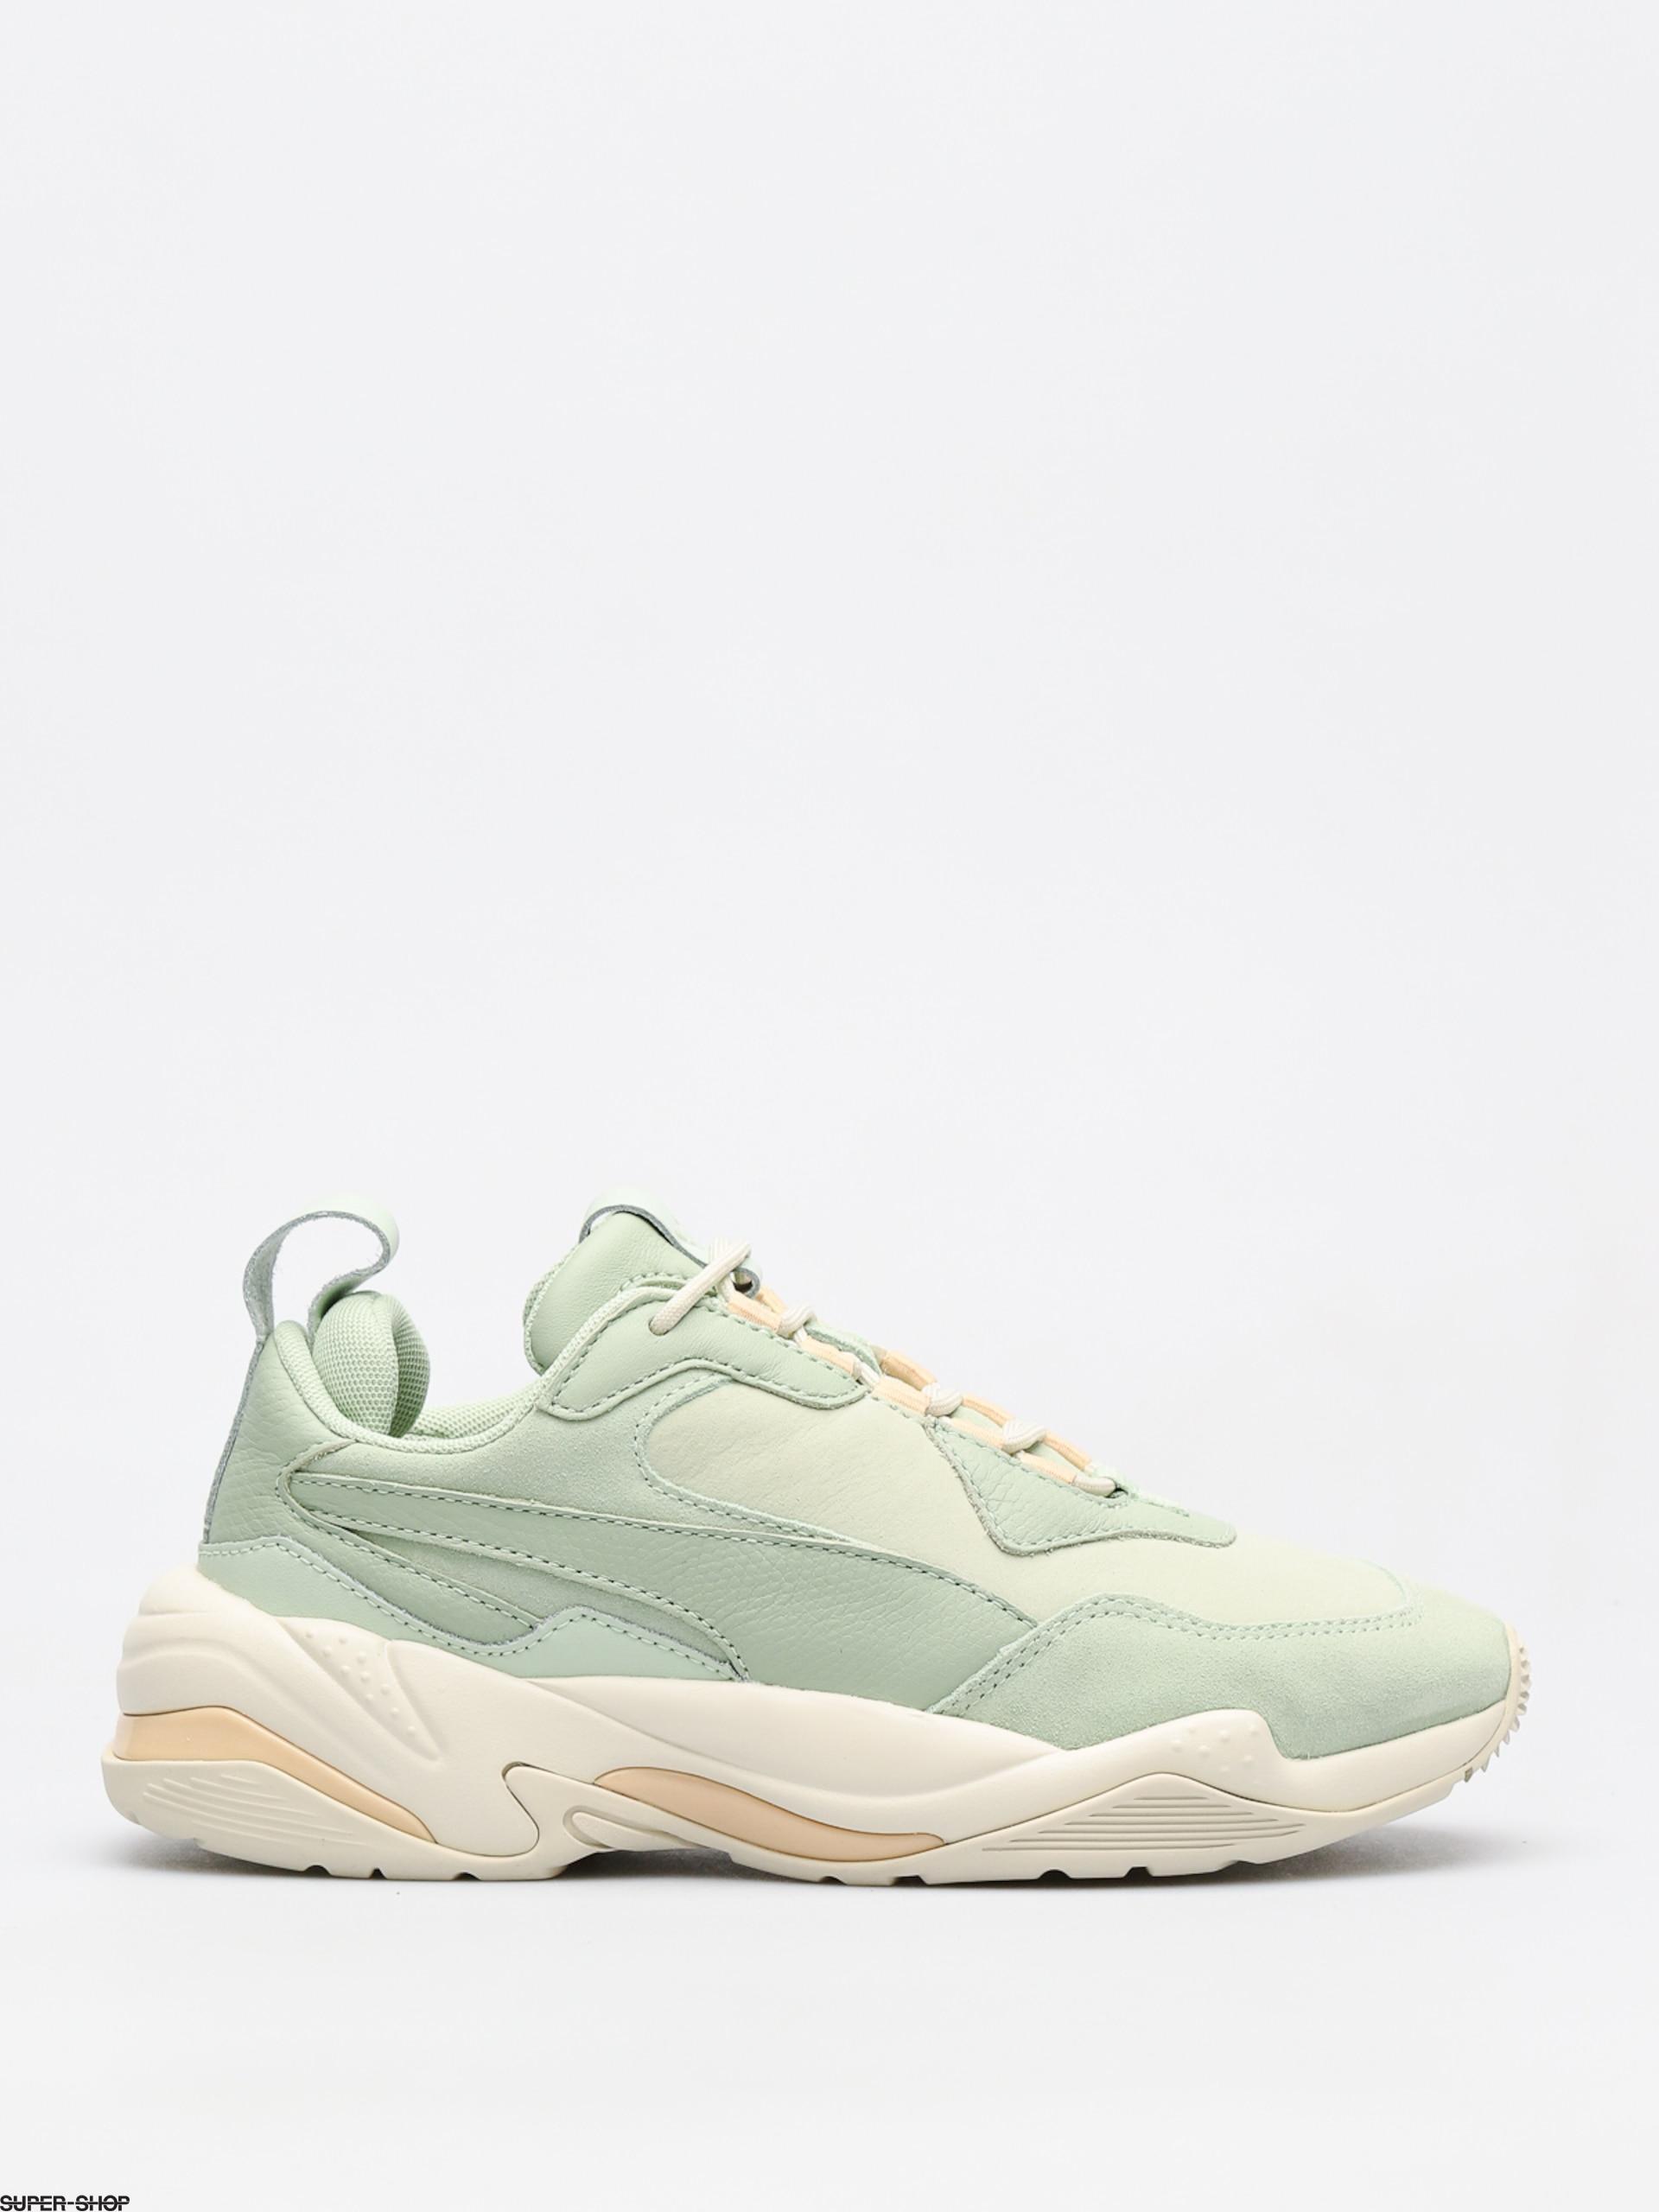 Puma Shoes Thunder Desert Wmn (smoke green/silver g)